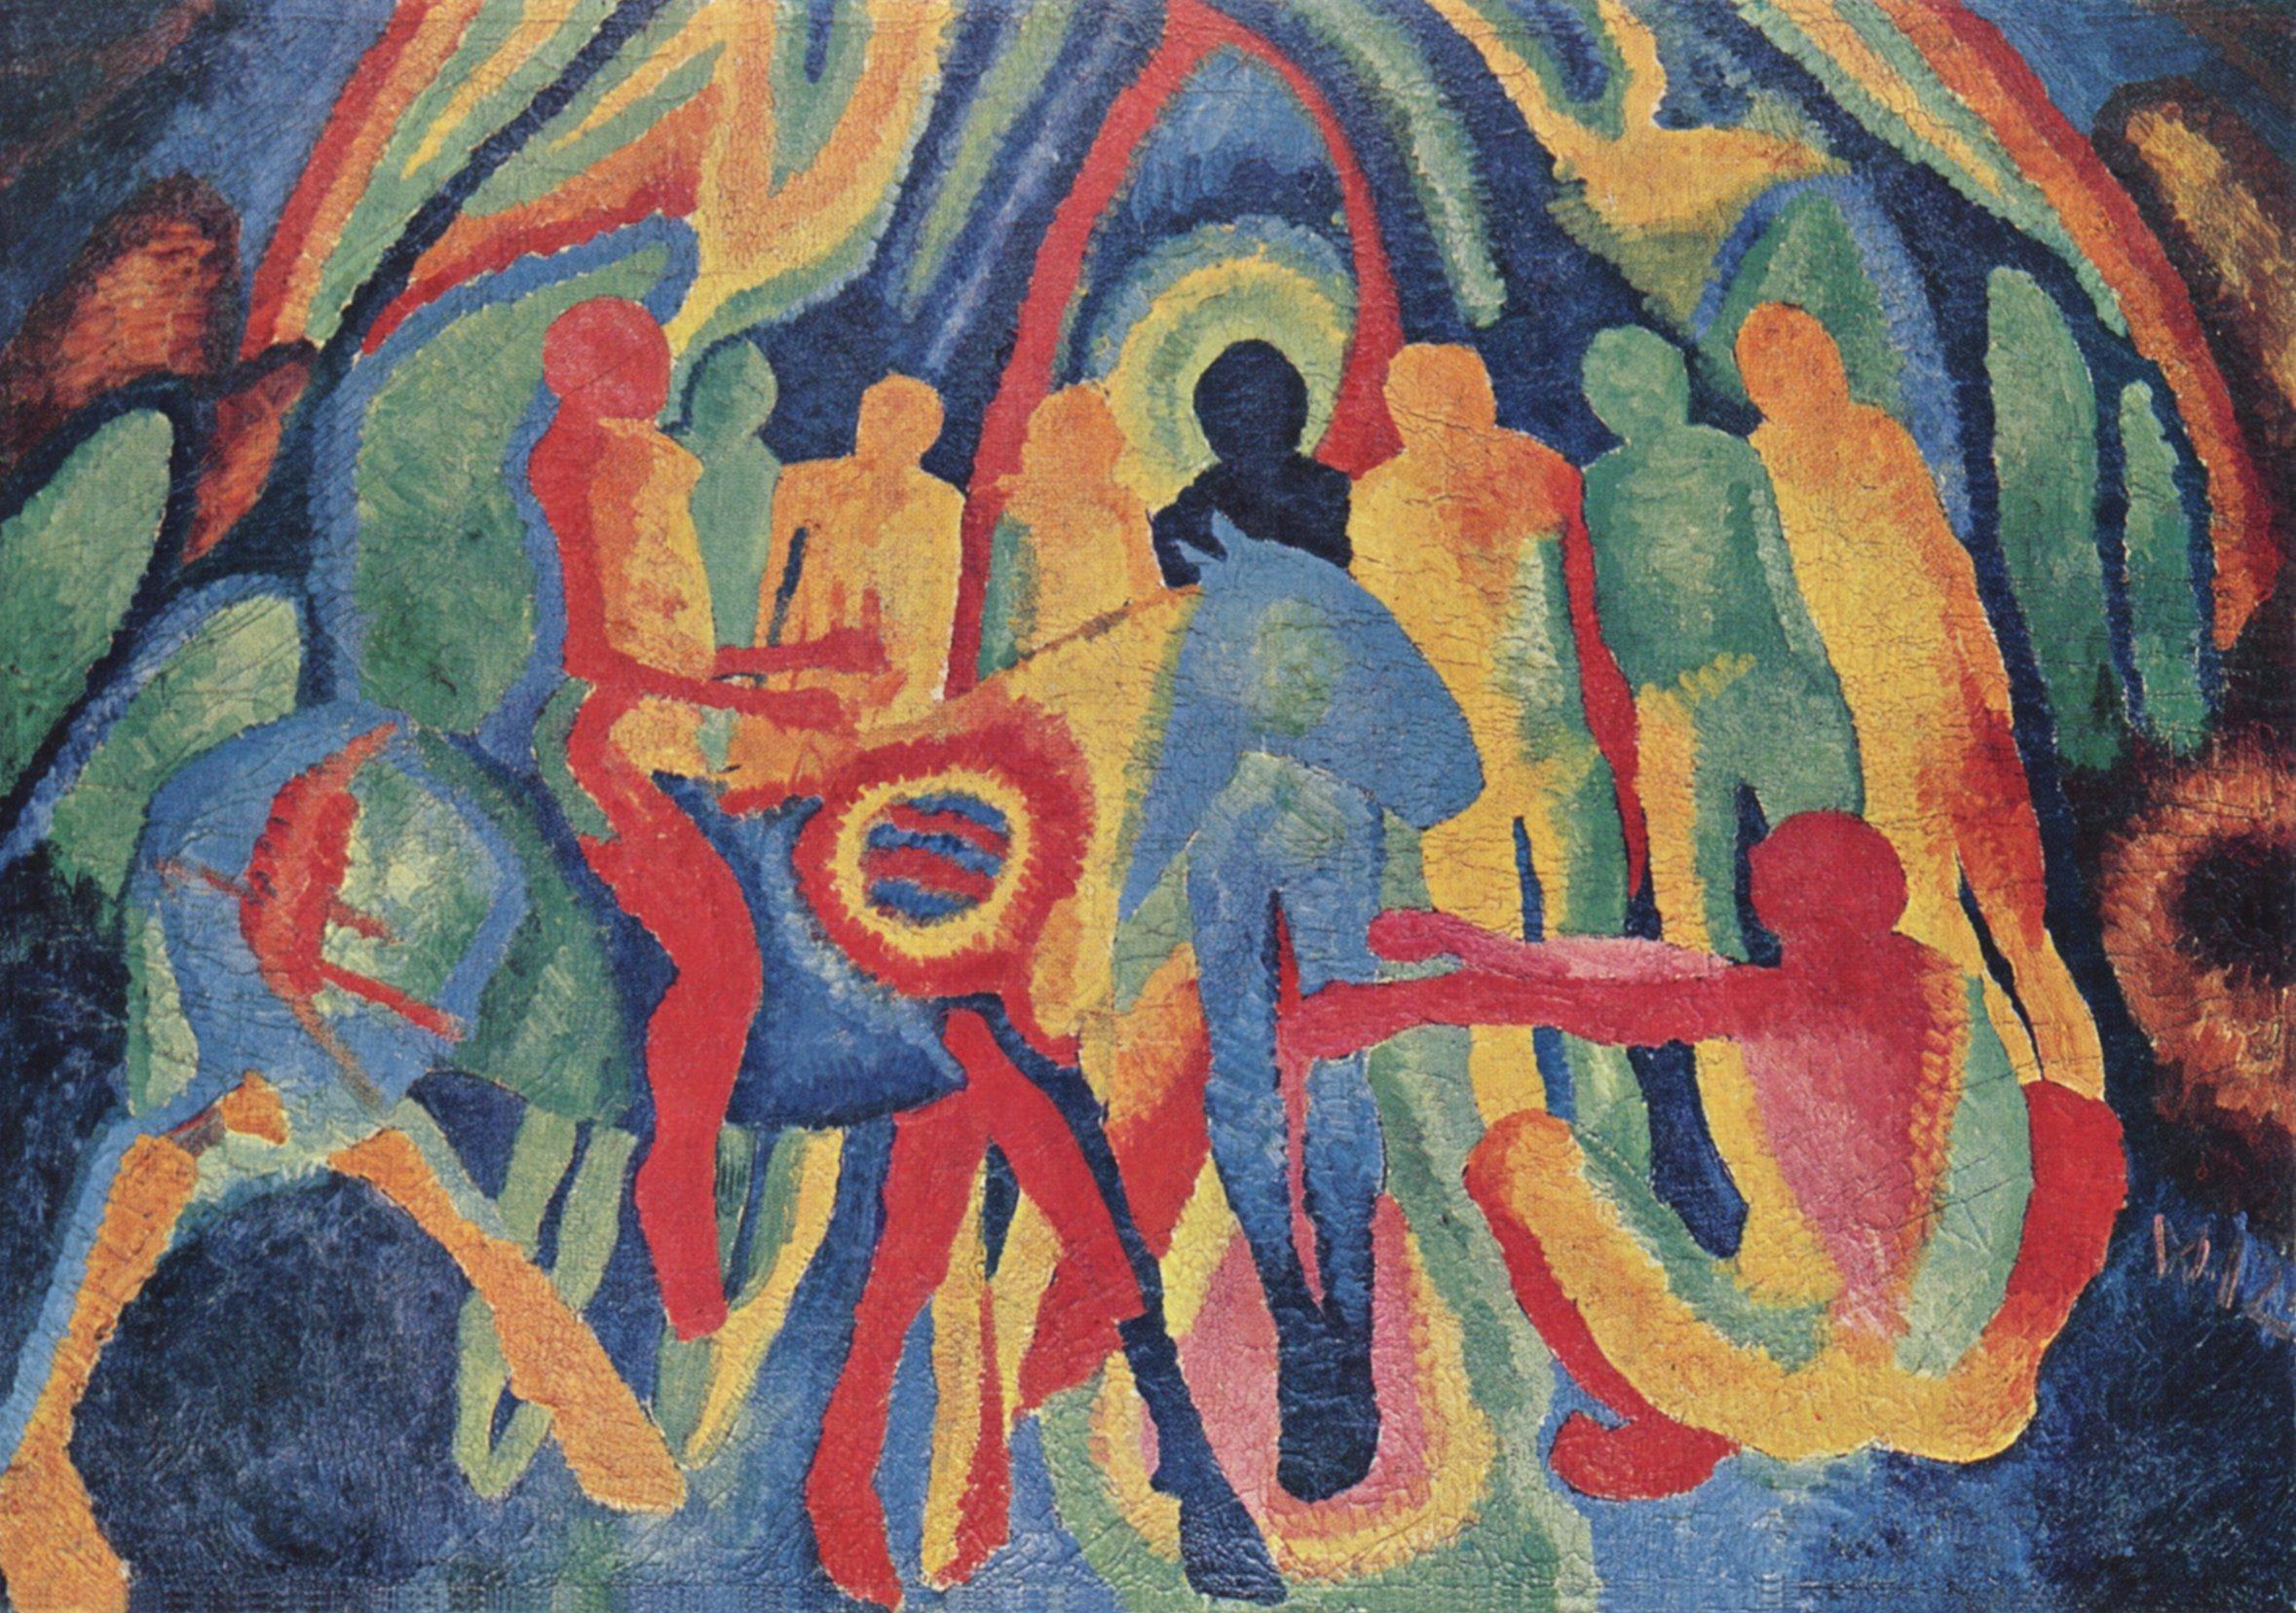 """ Entry of Christ into Jerusalem "" by Wilhelm Morgner (1891–1917), Museum am Ostwall (Dortmund, Germany) . Downloaded from the Vanderbilt Digital Library  http://diglib.library.vanderbilt.edu/act-imagelink.pl?RC=54247 ."